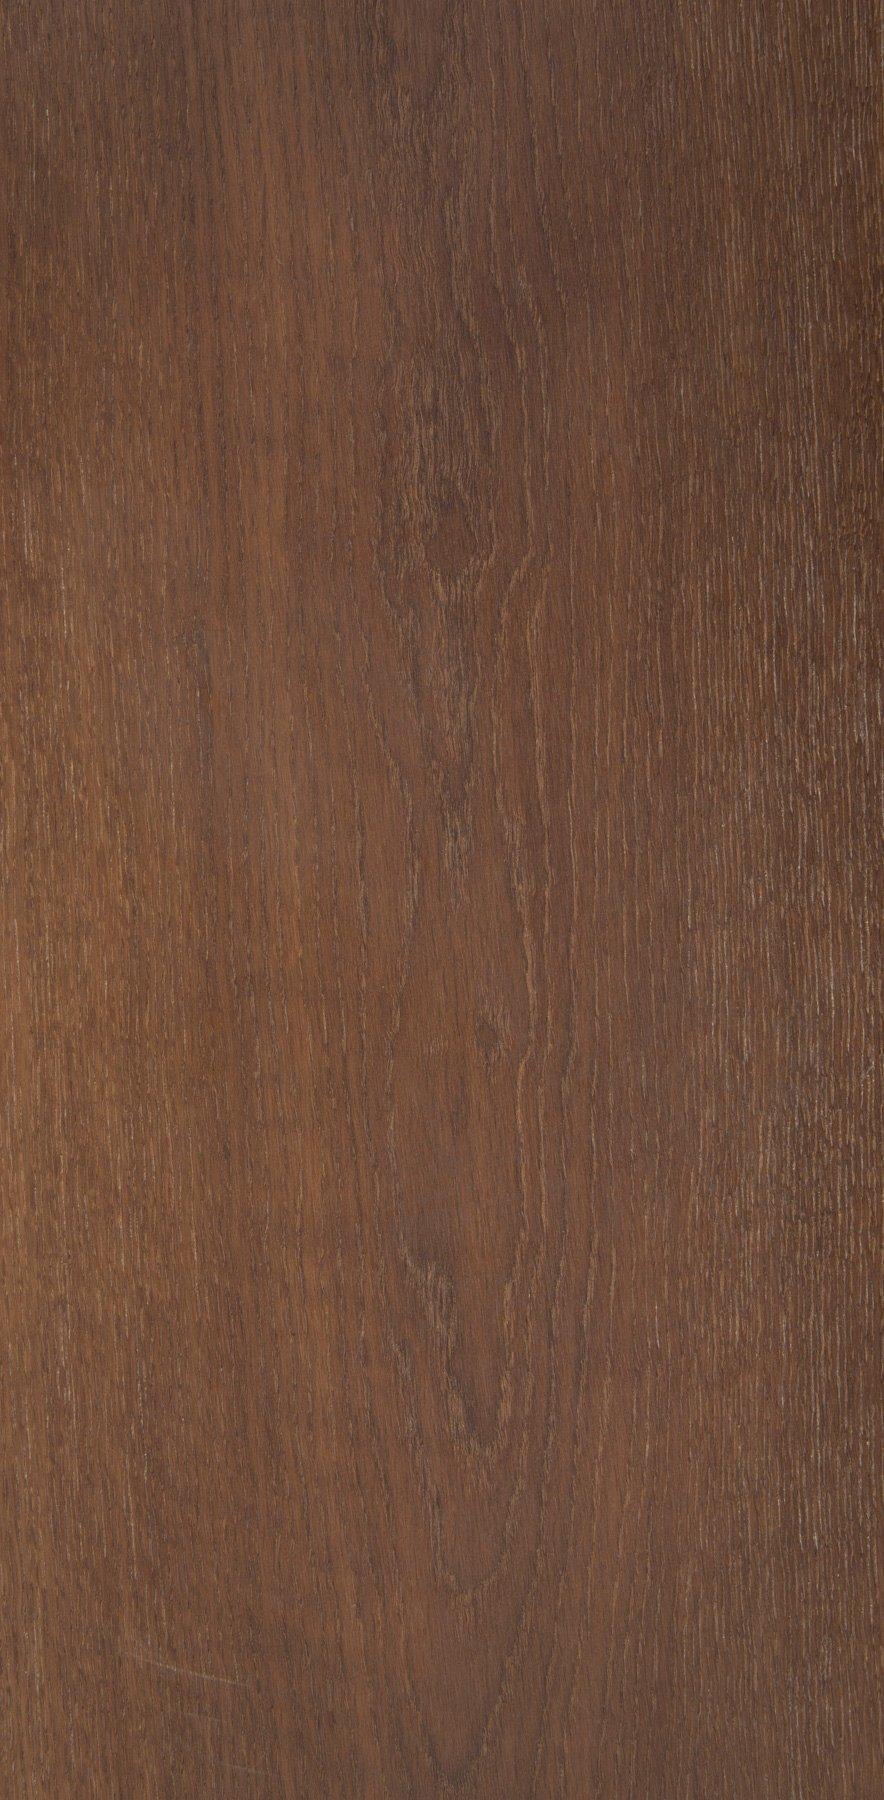 maderas-terramont-les-terres-camargue